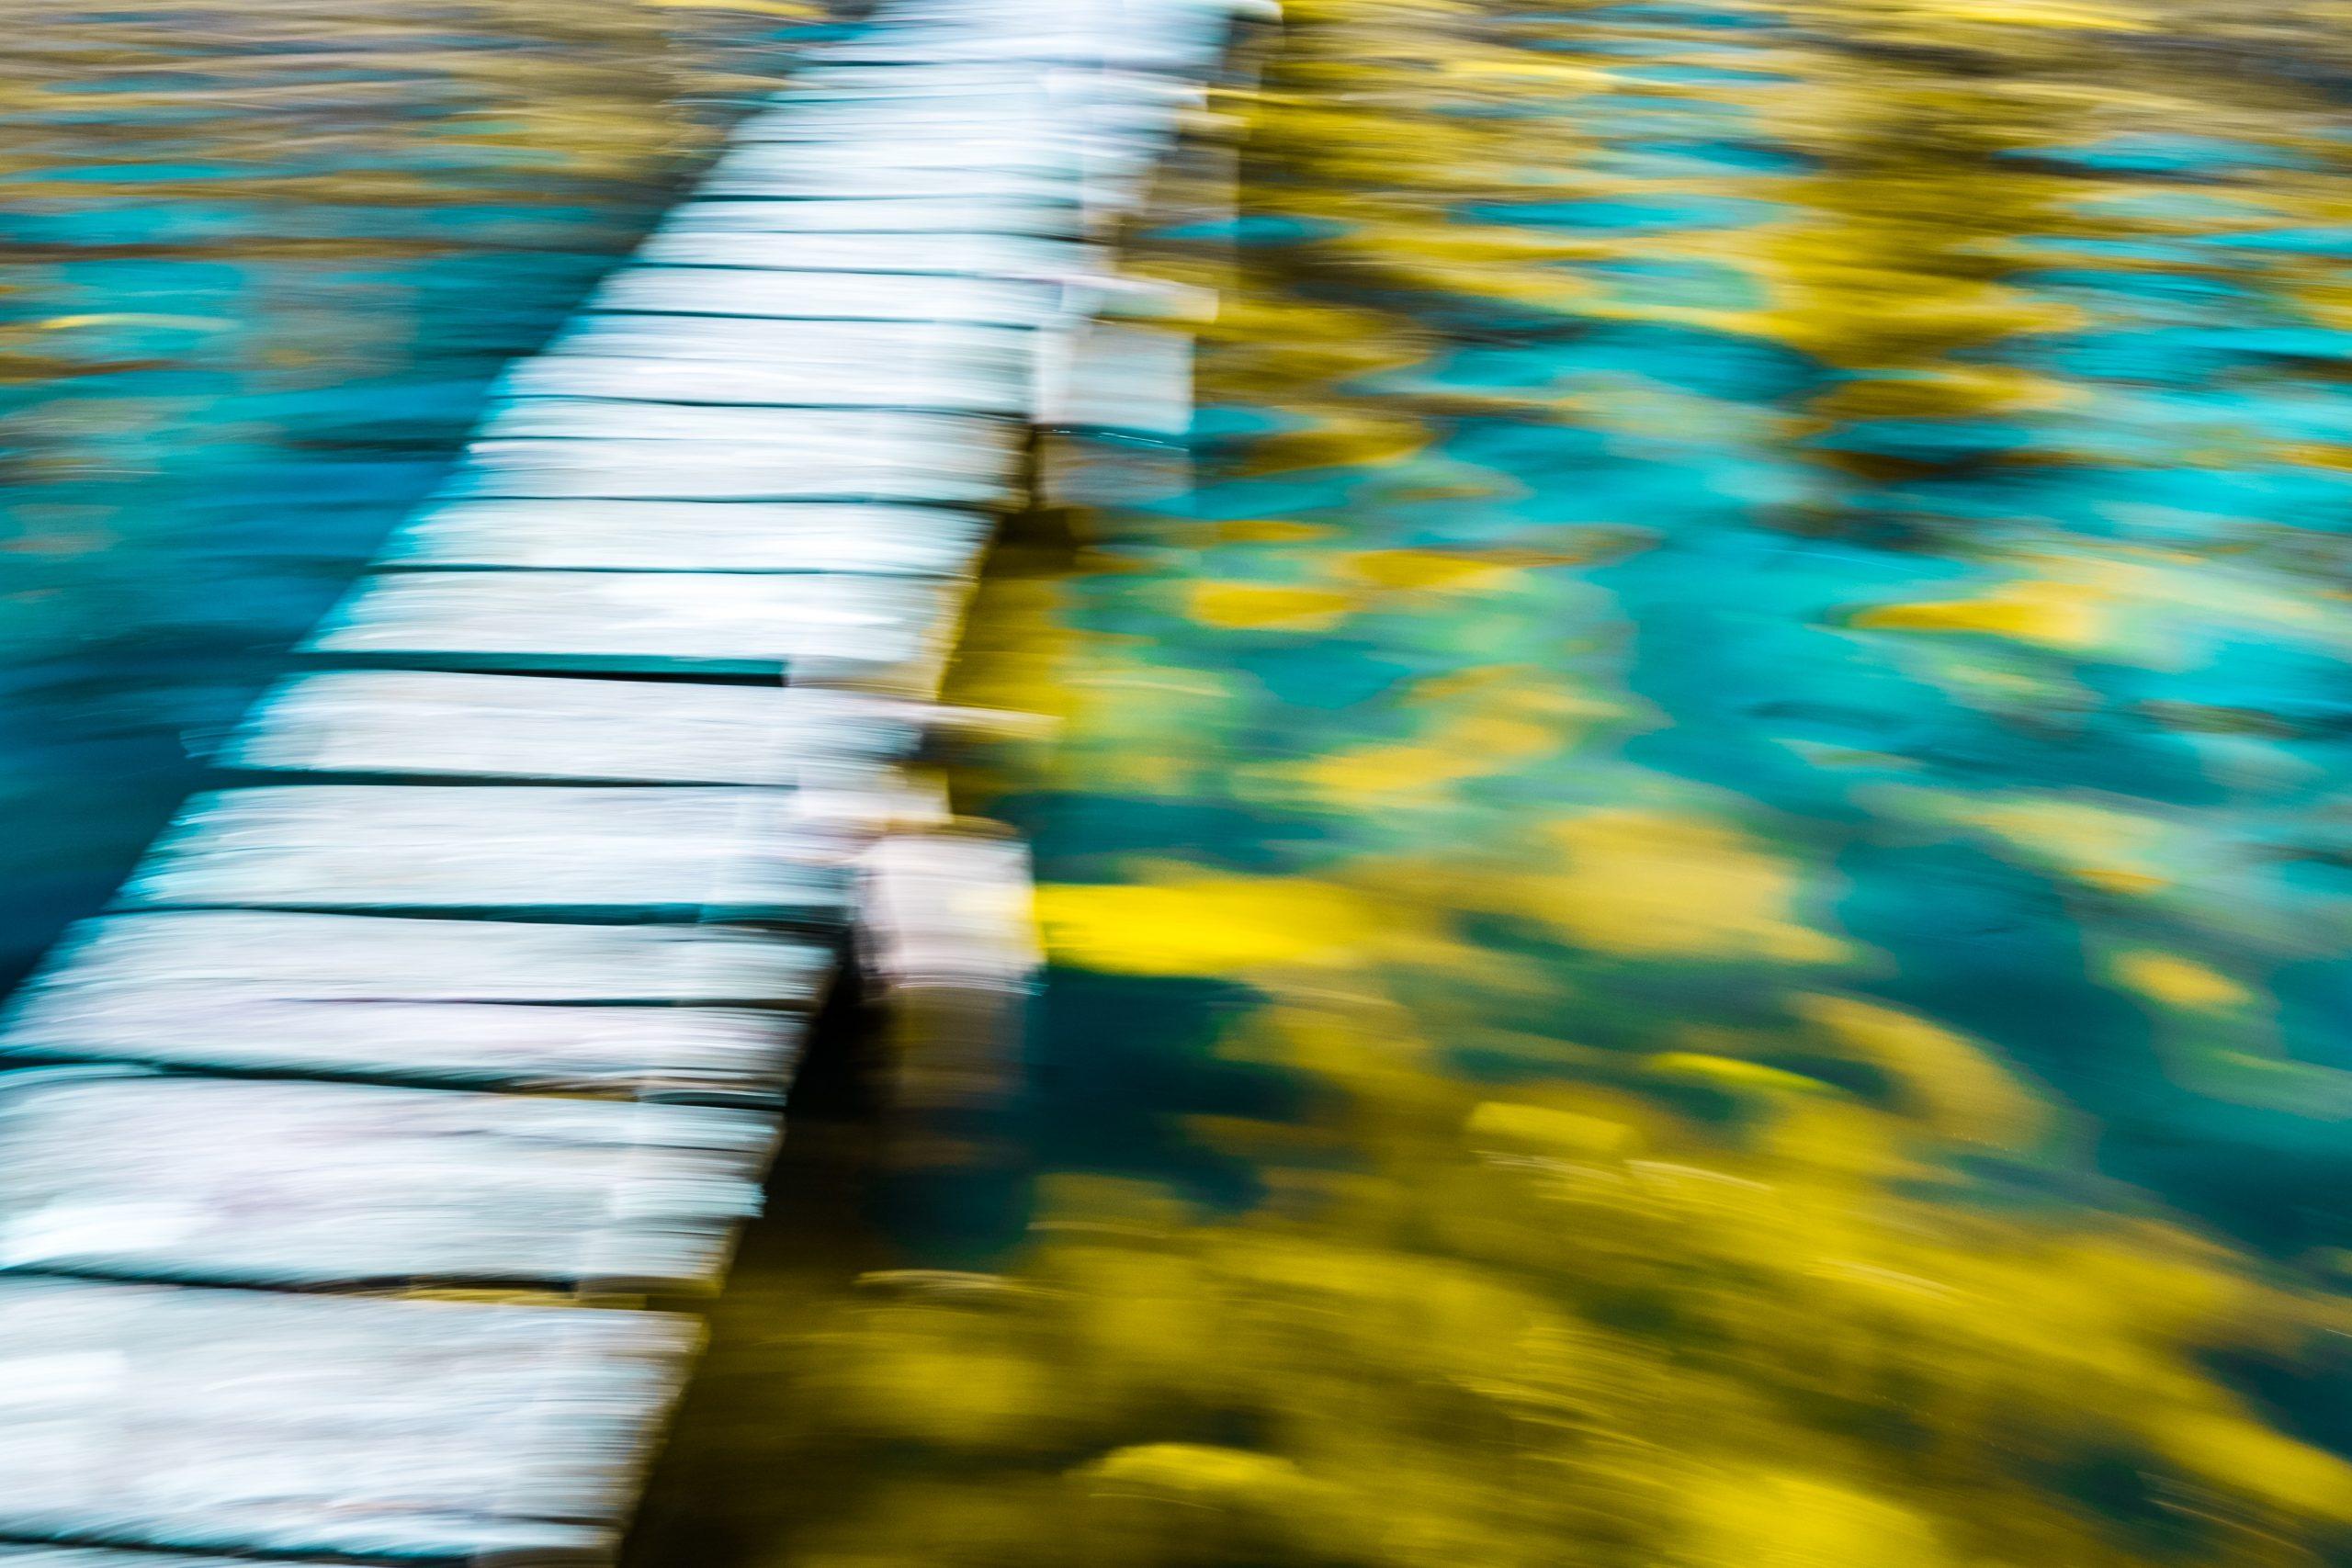 BL_Lago_Colore_-Alpenvorland-_SebastianKrawczyk